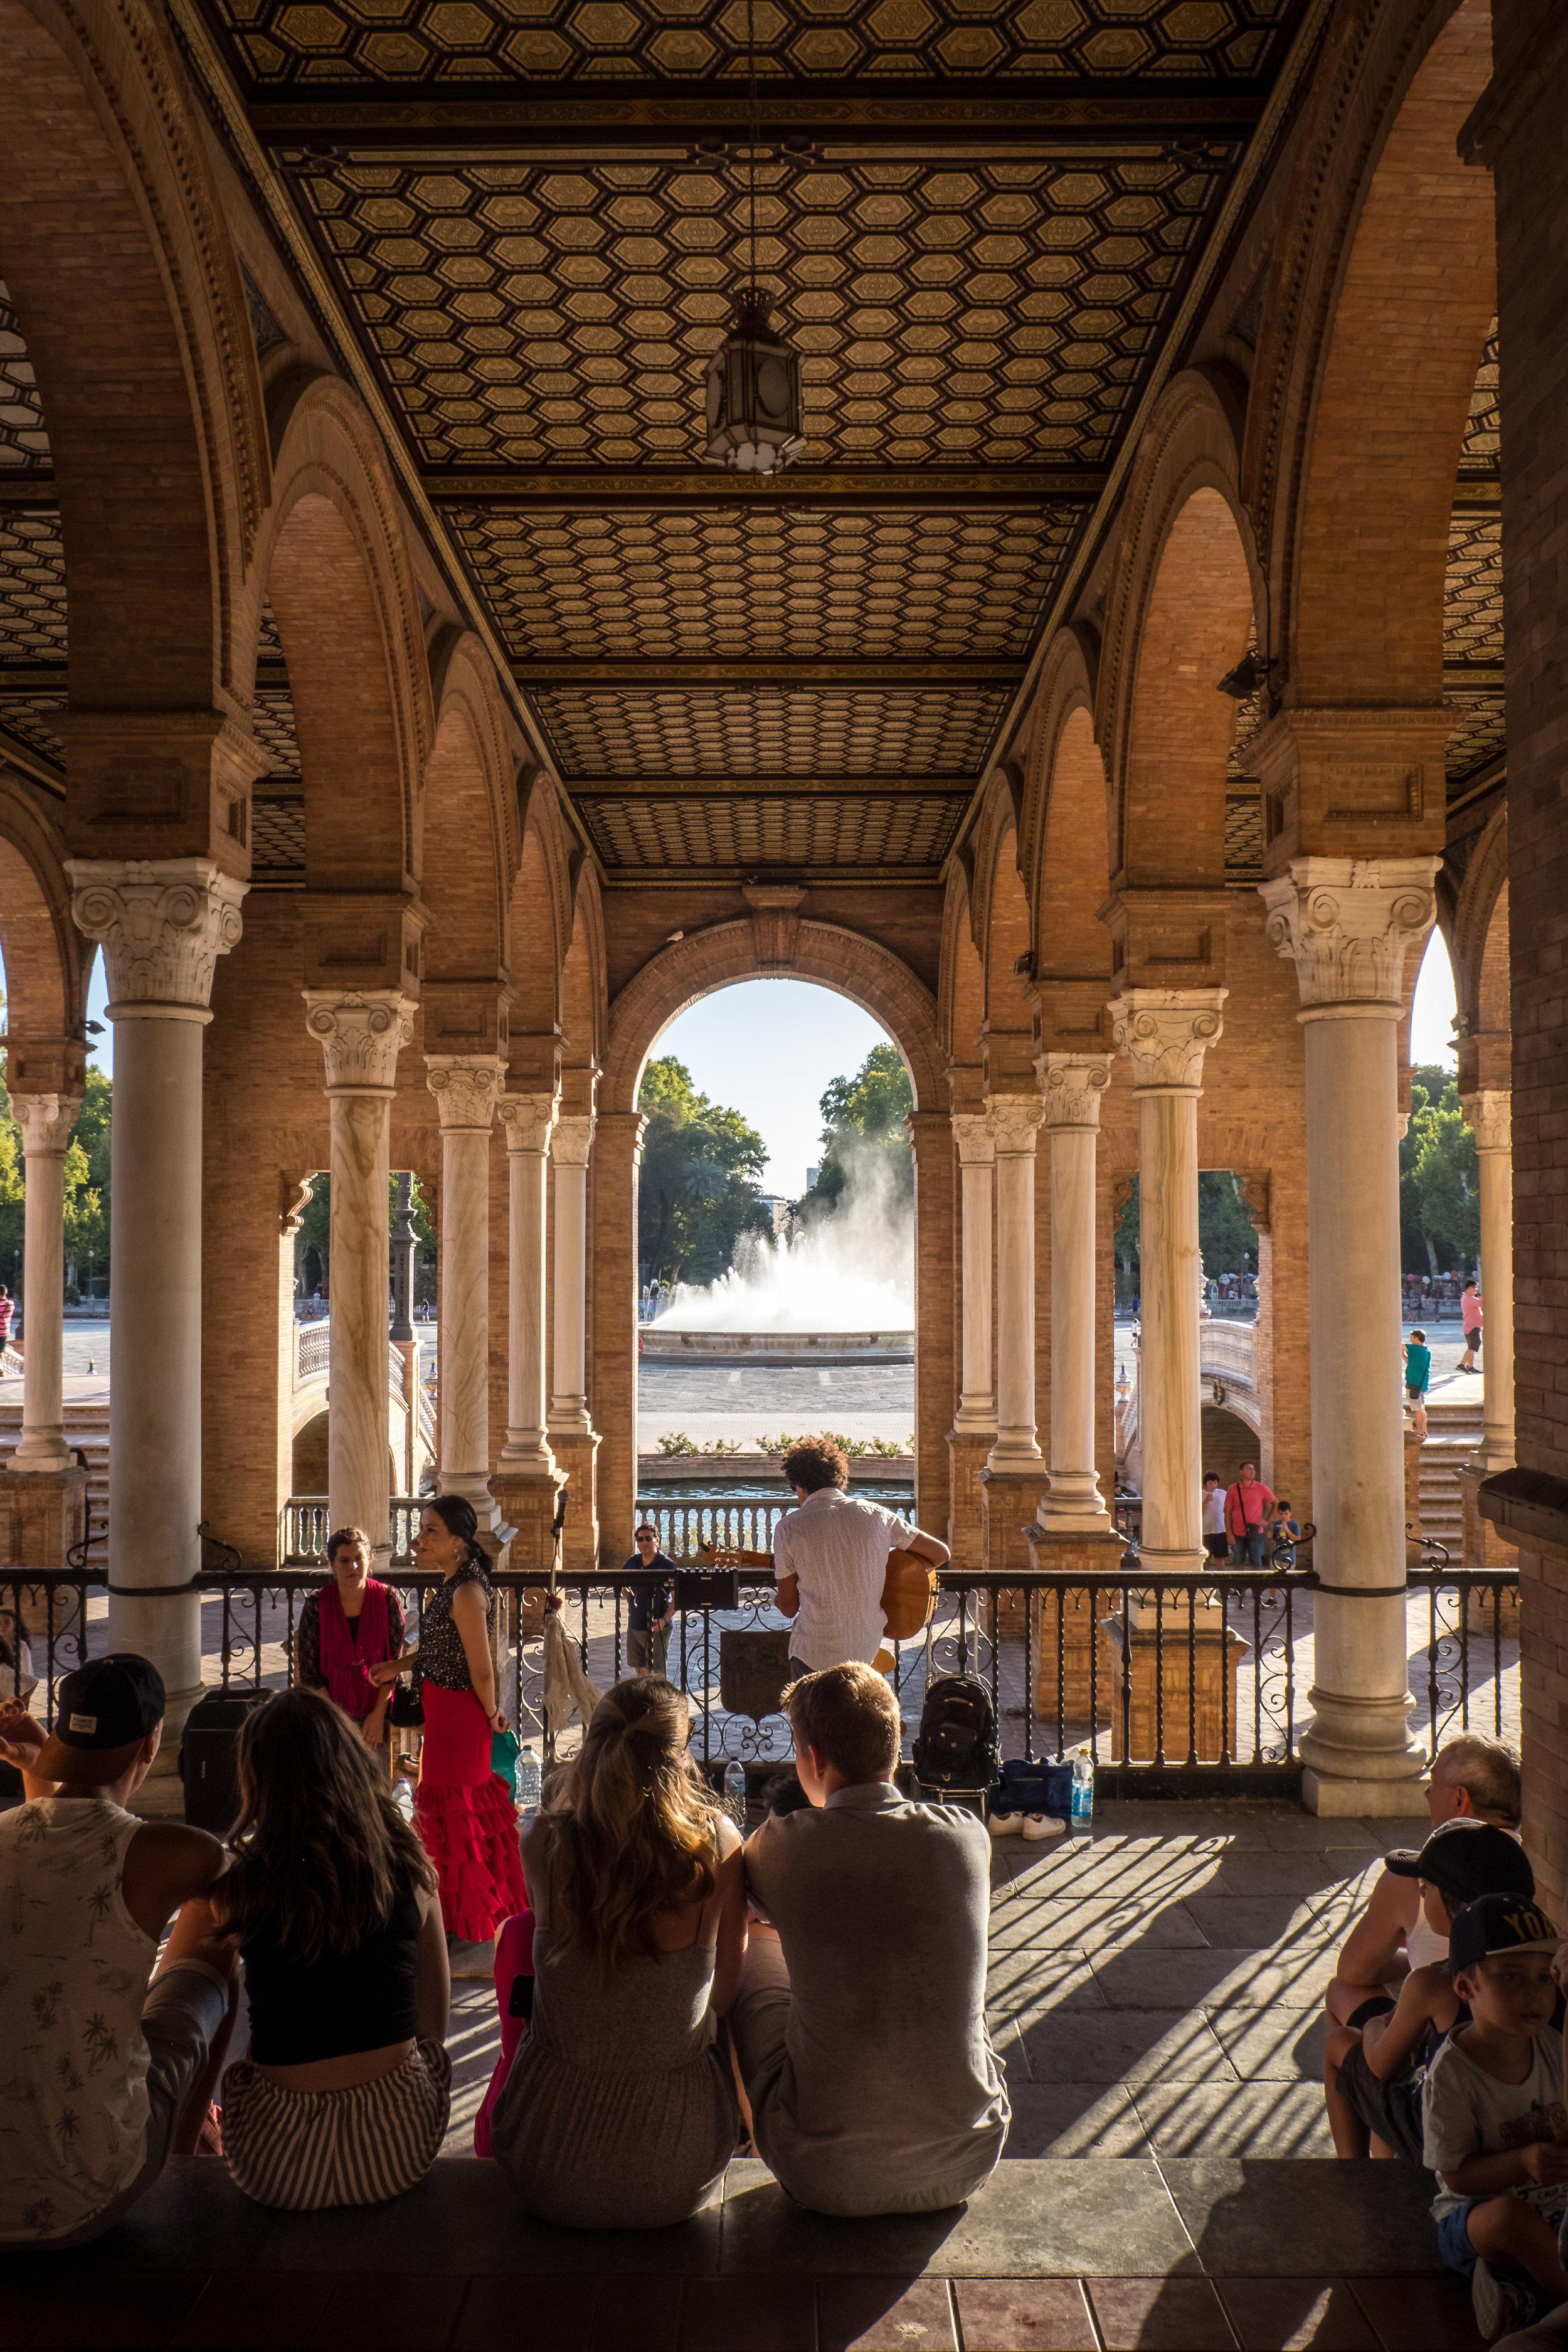 Sevilla_Plaza de Espana-4.jpg